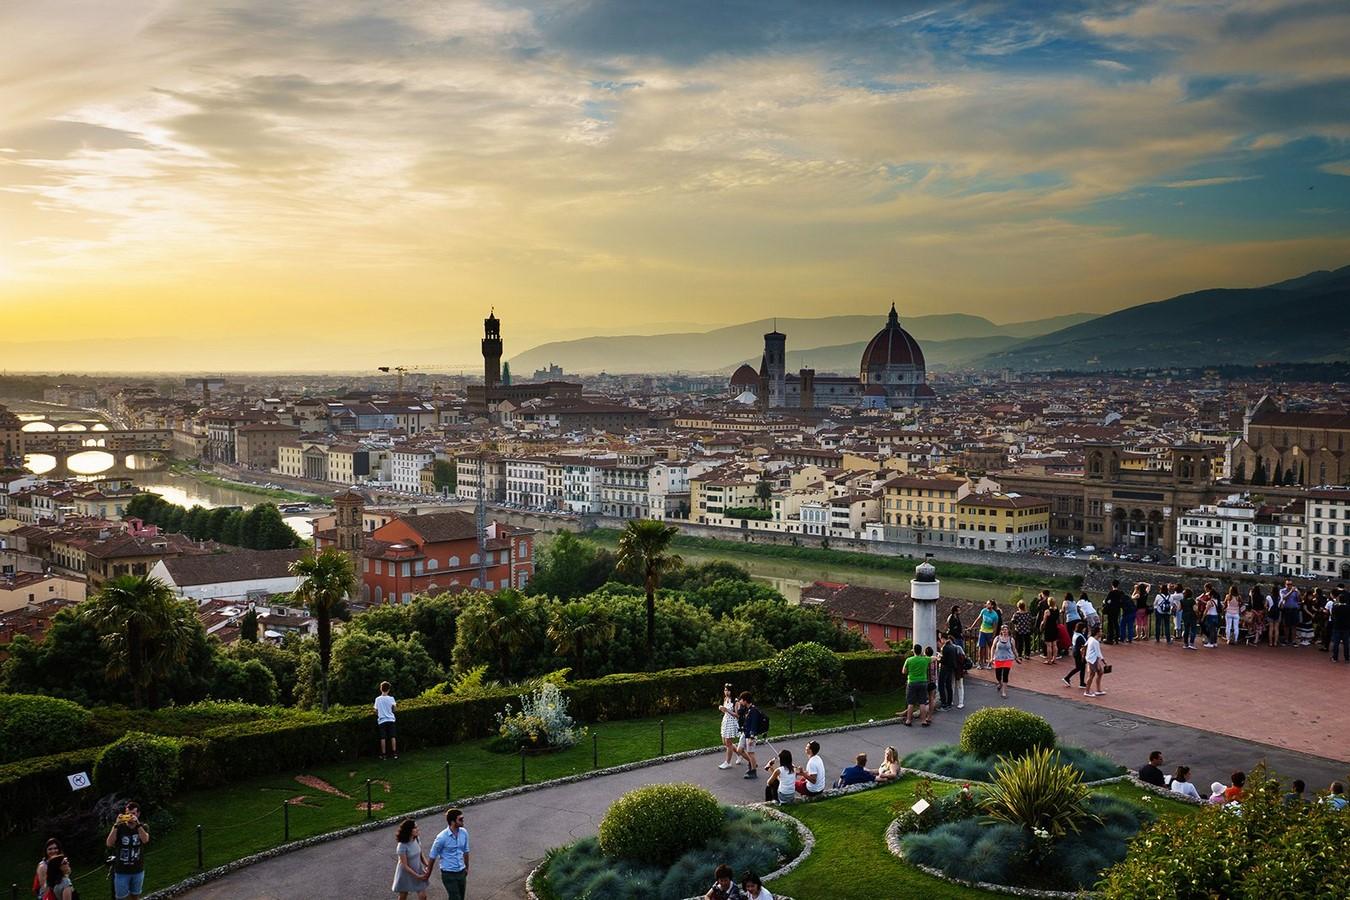 Piazzale Michelangelo - Sheet1